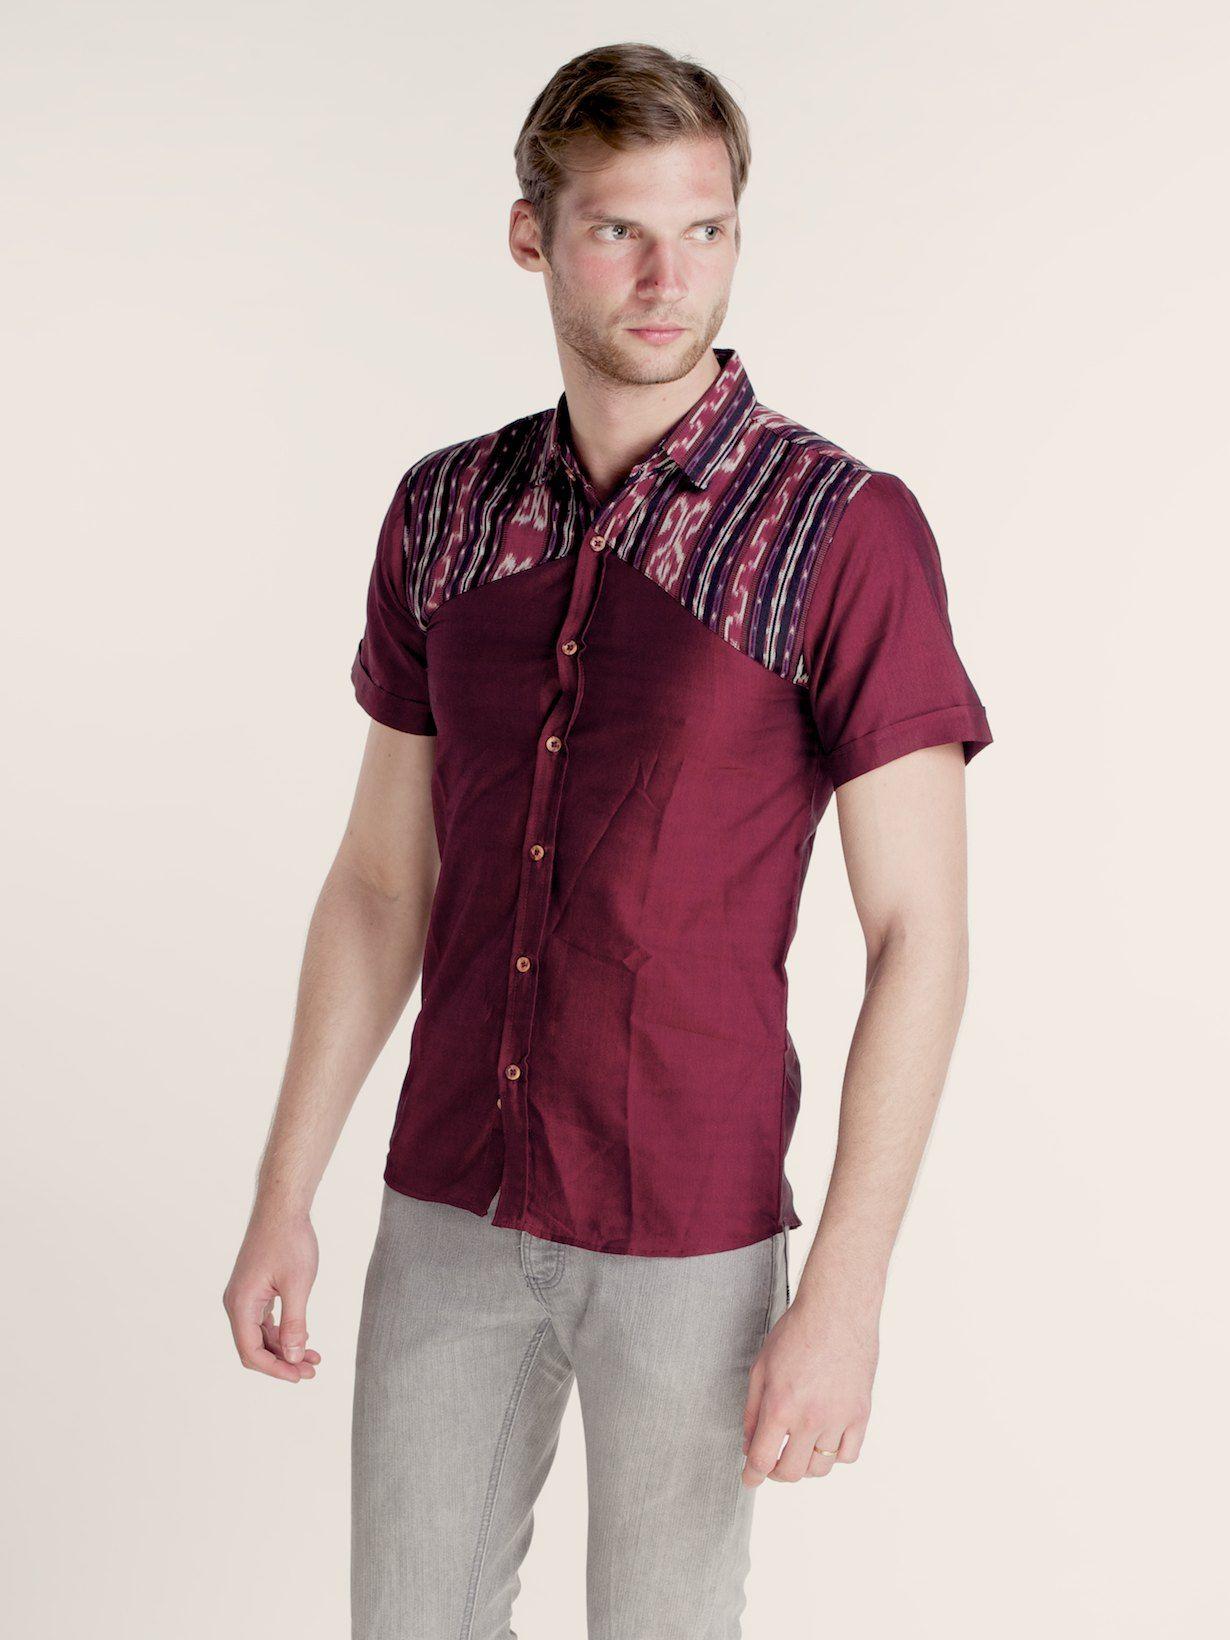 Maumere Tenun bination Shirt Dark Maroon